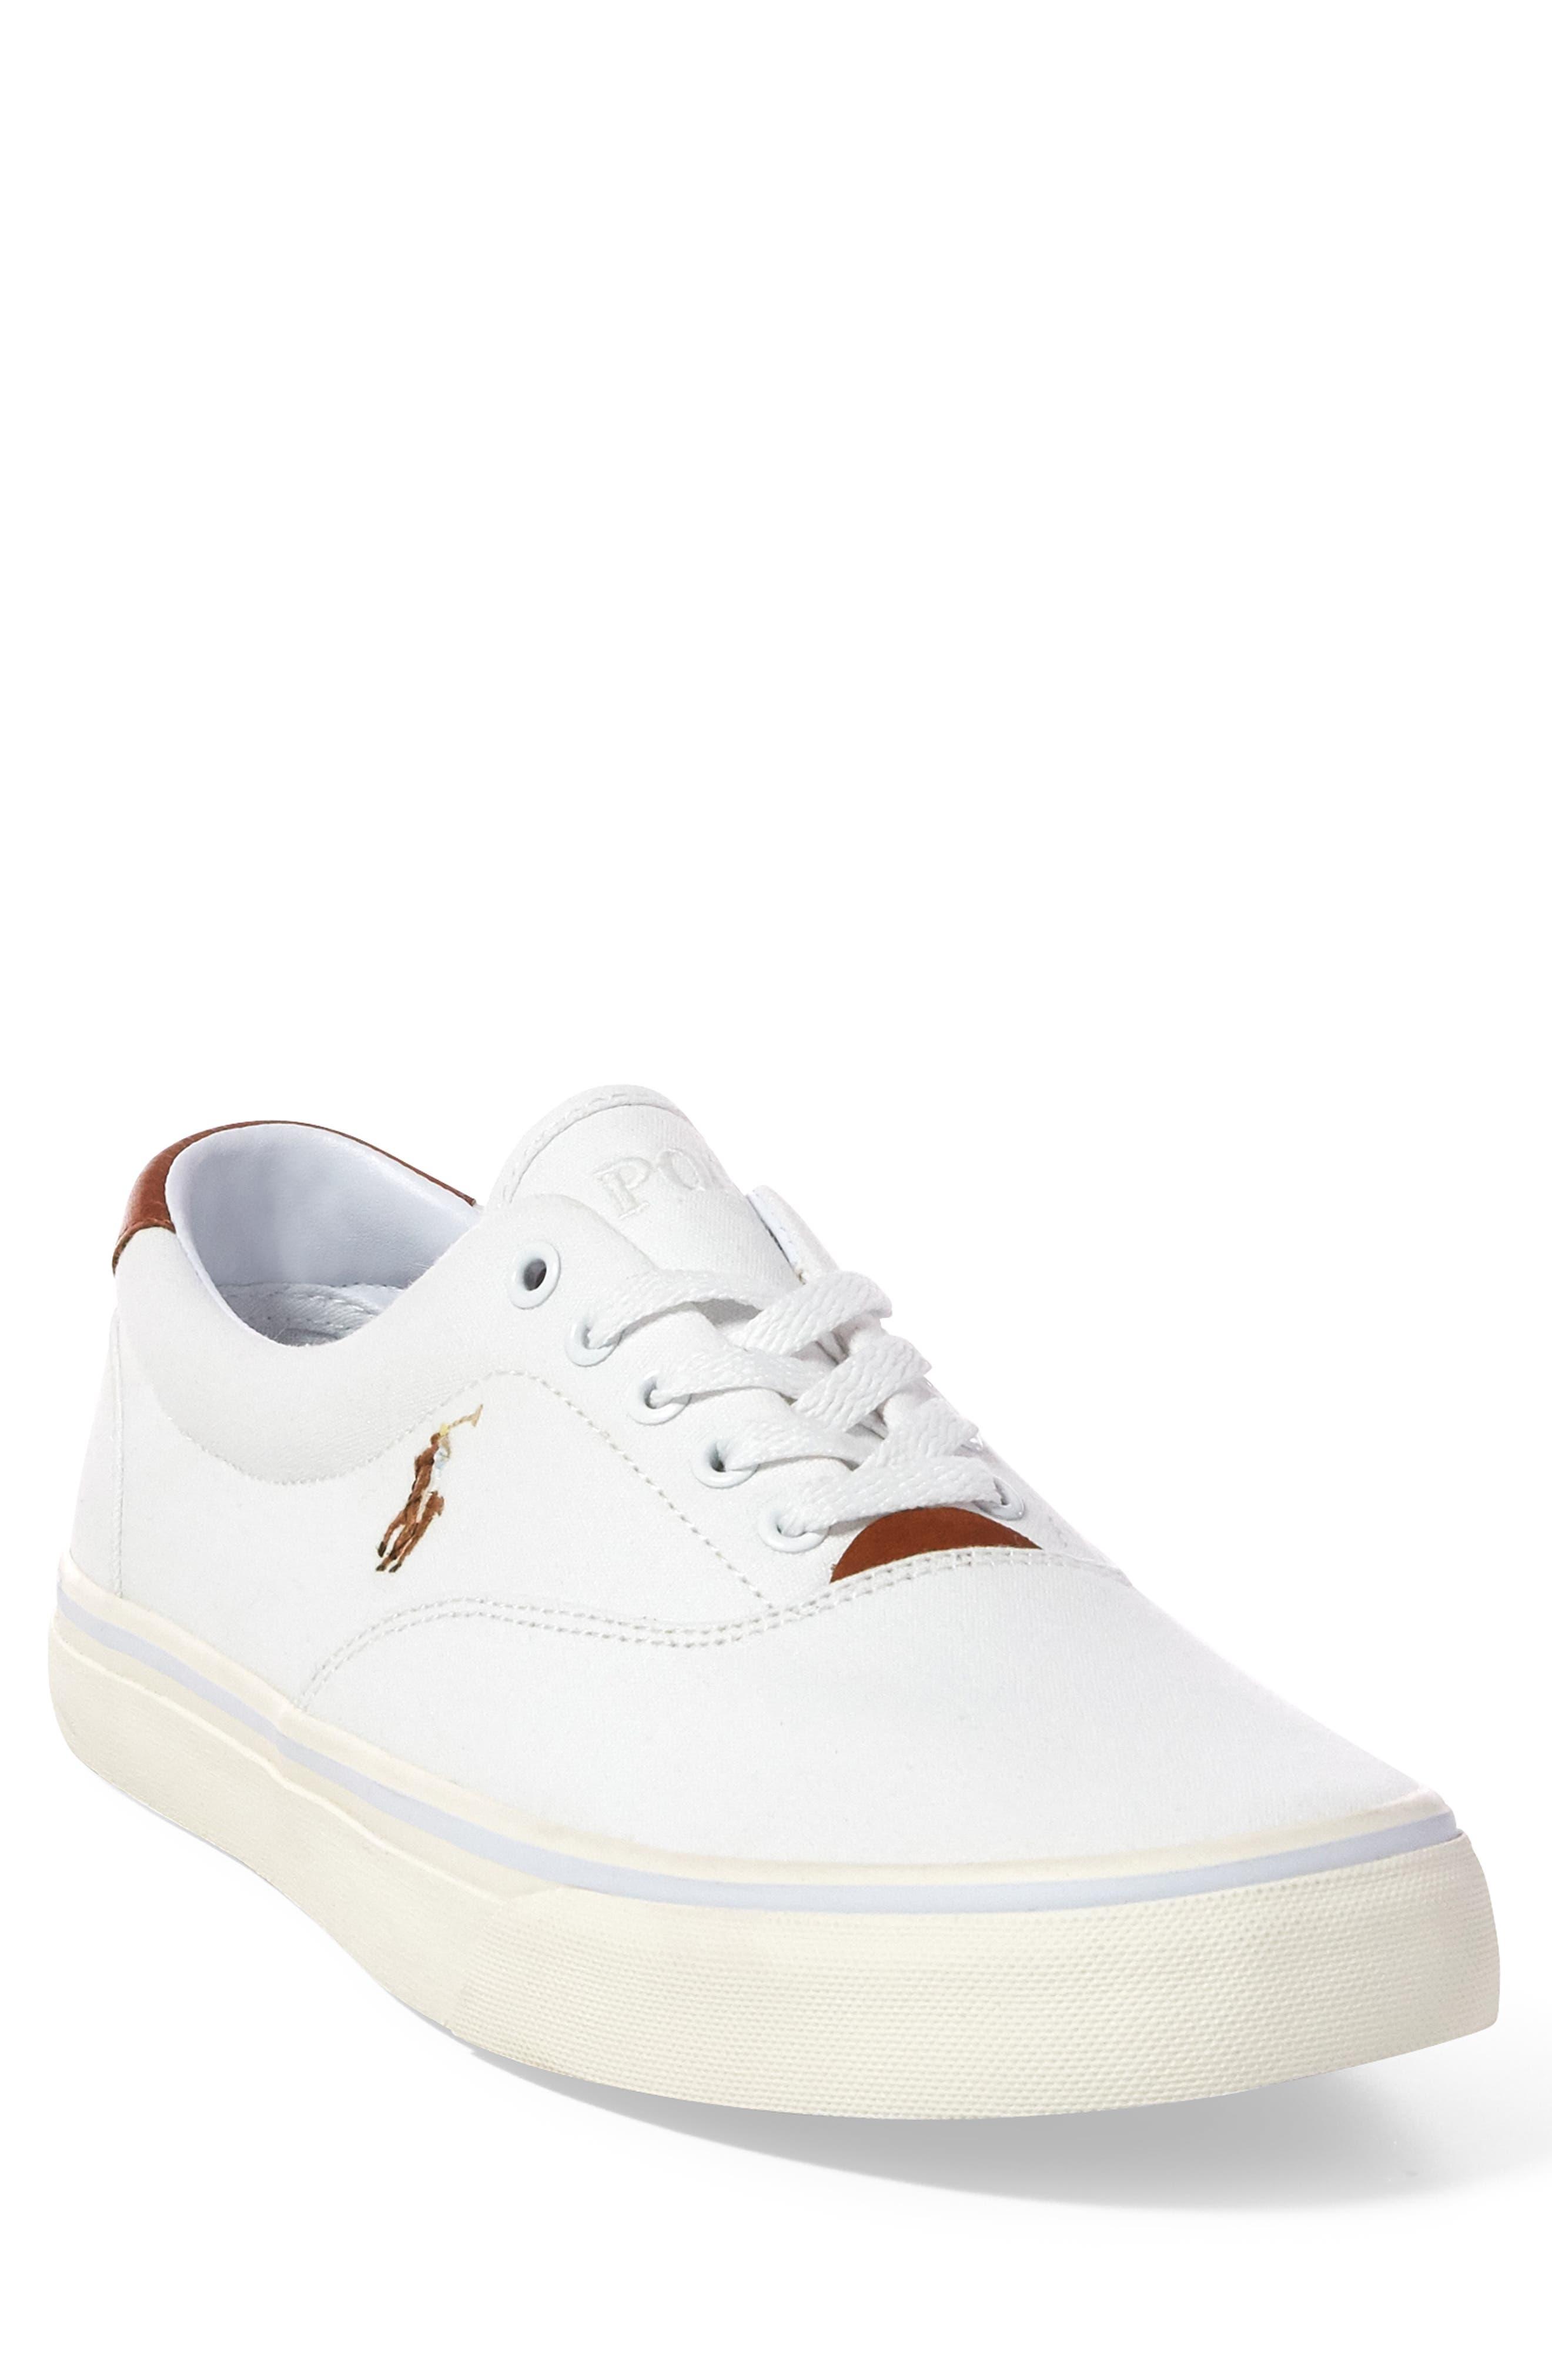 POLO RALPH LAUREN,                             Thorton Low Top Sneaker,                             Alternate thumbnail 5, color,                             WHITE CANVAS